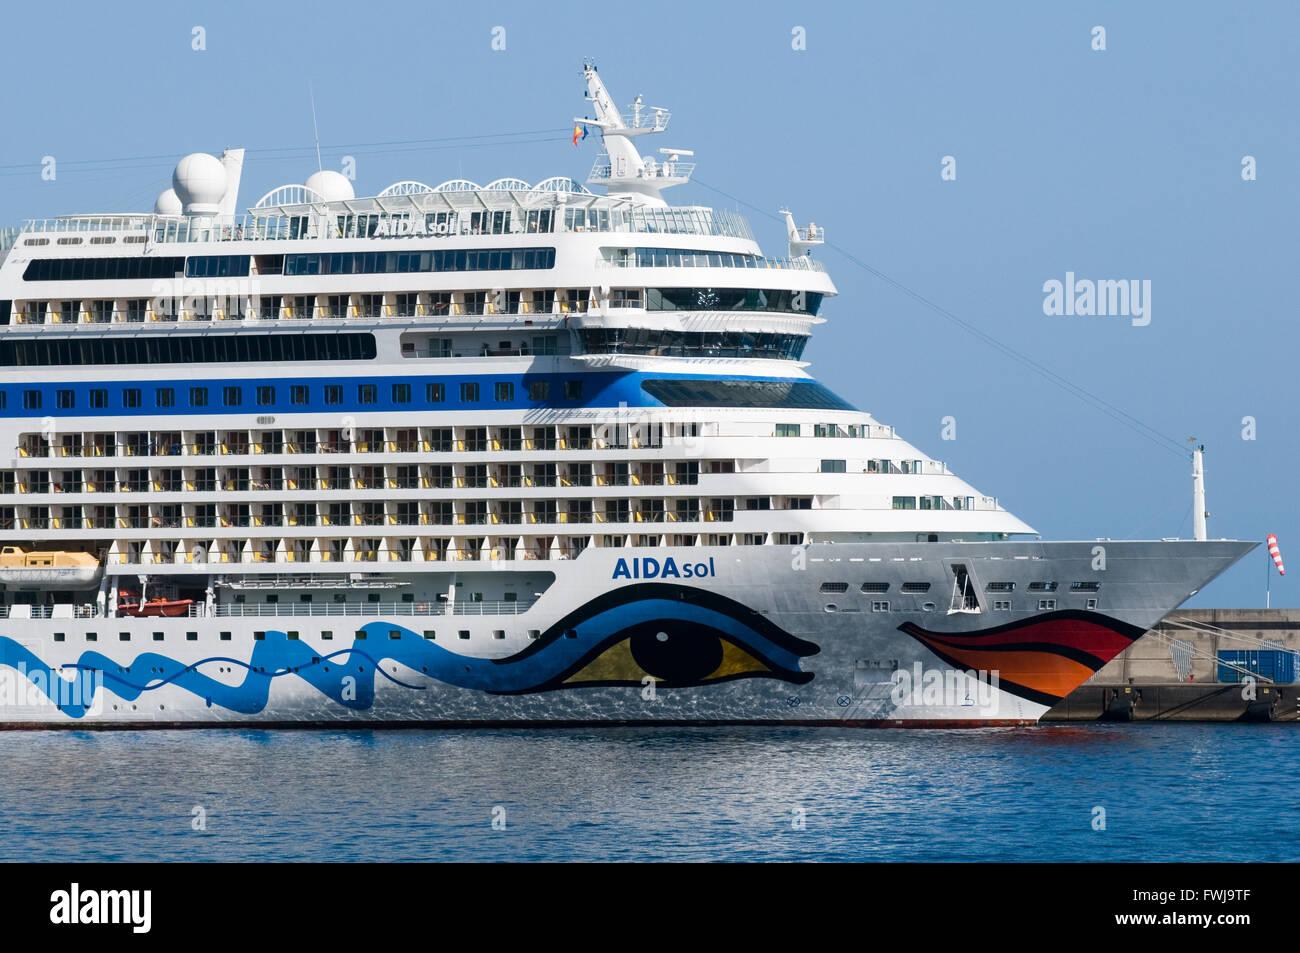 AIDAsol AIDA SOL cruiseship cruiseships ship ships german owned by AIDA cruises - Stock Image